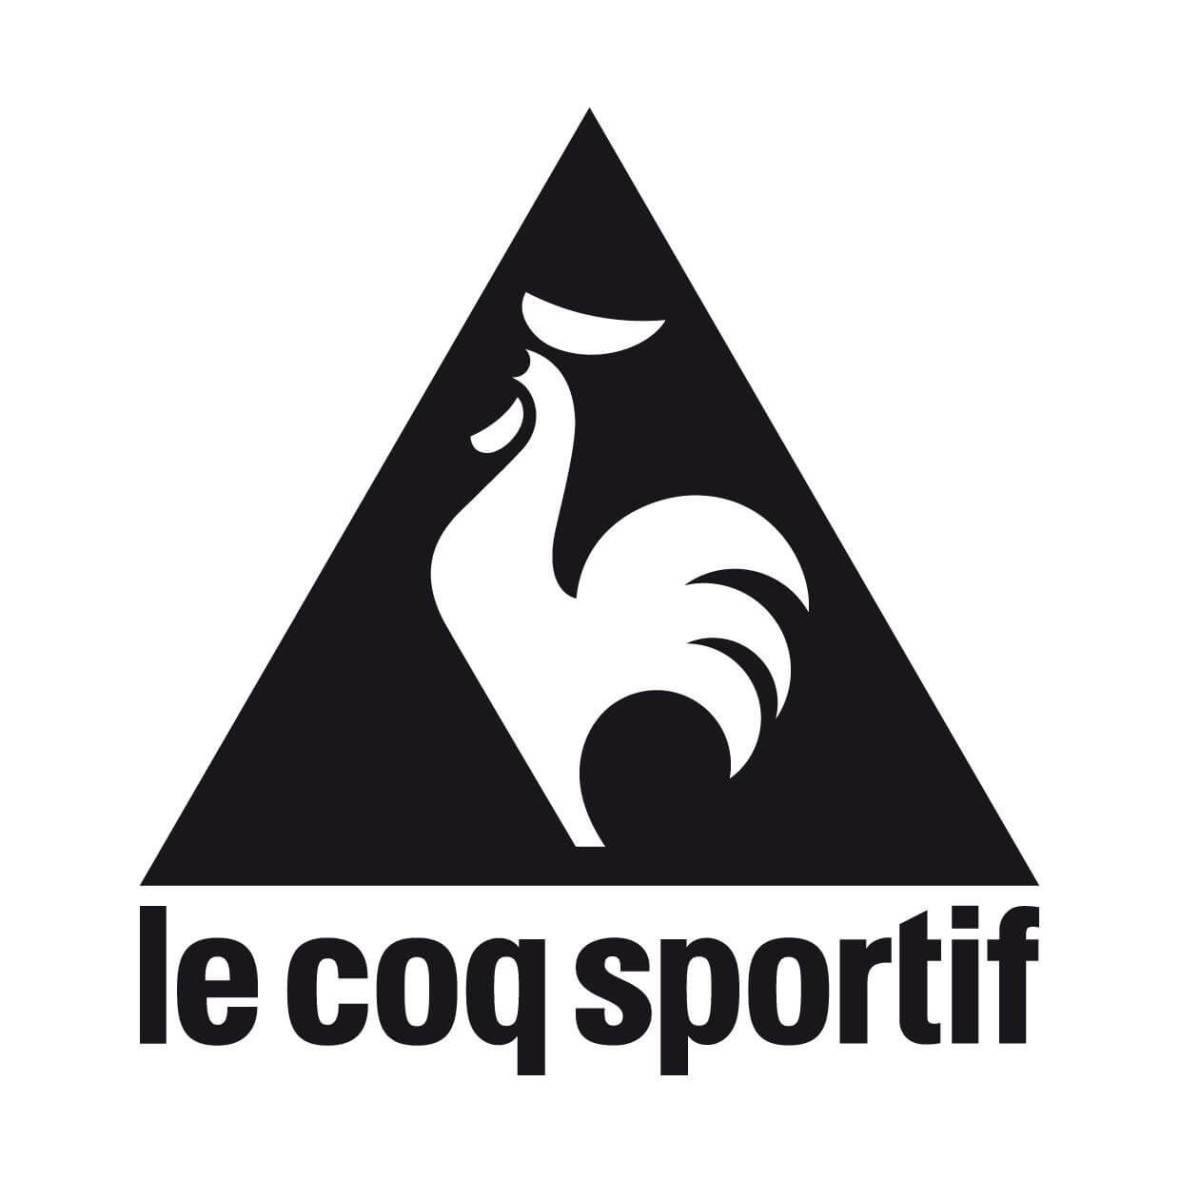 LeCoqSportif LCS R900 W Graphic_19